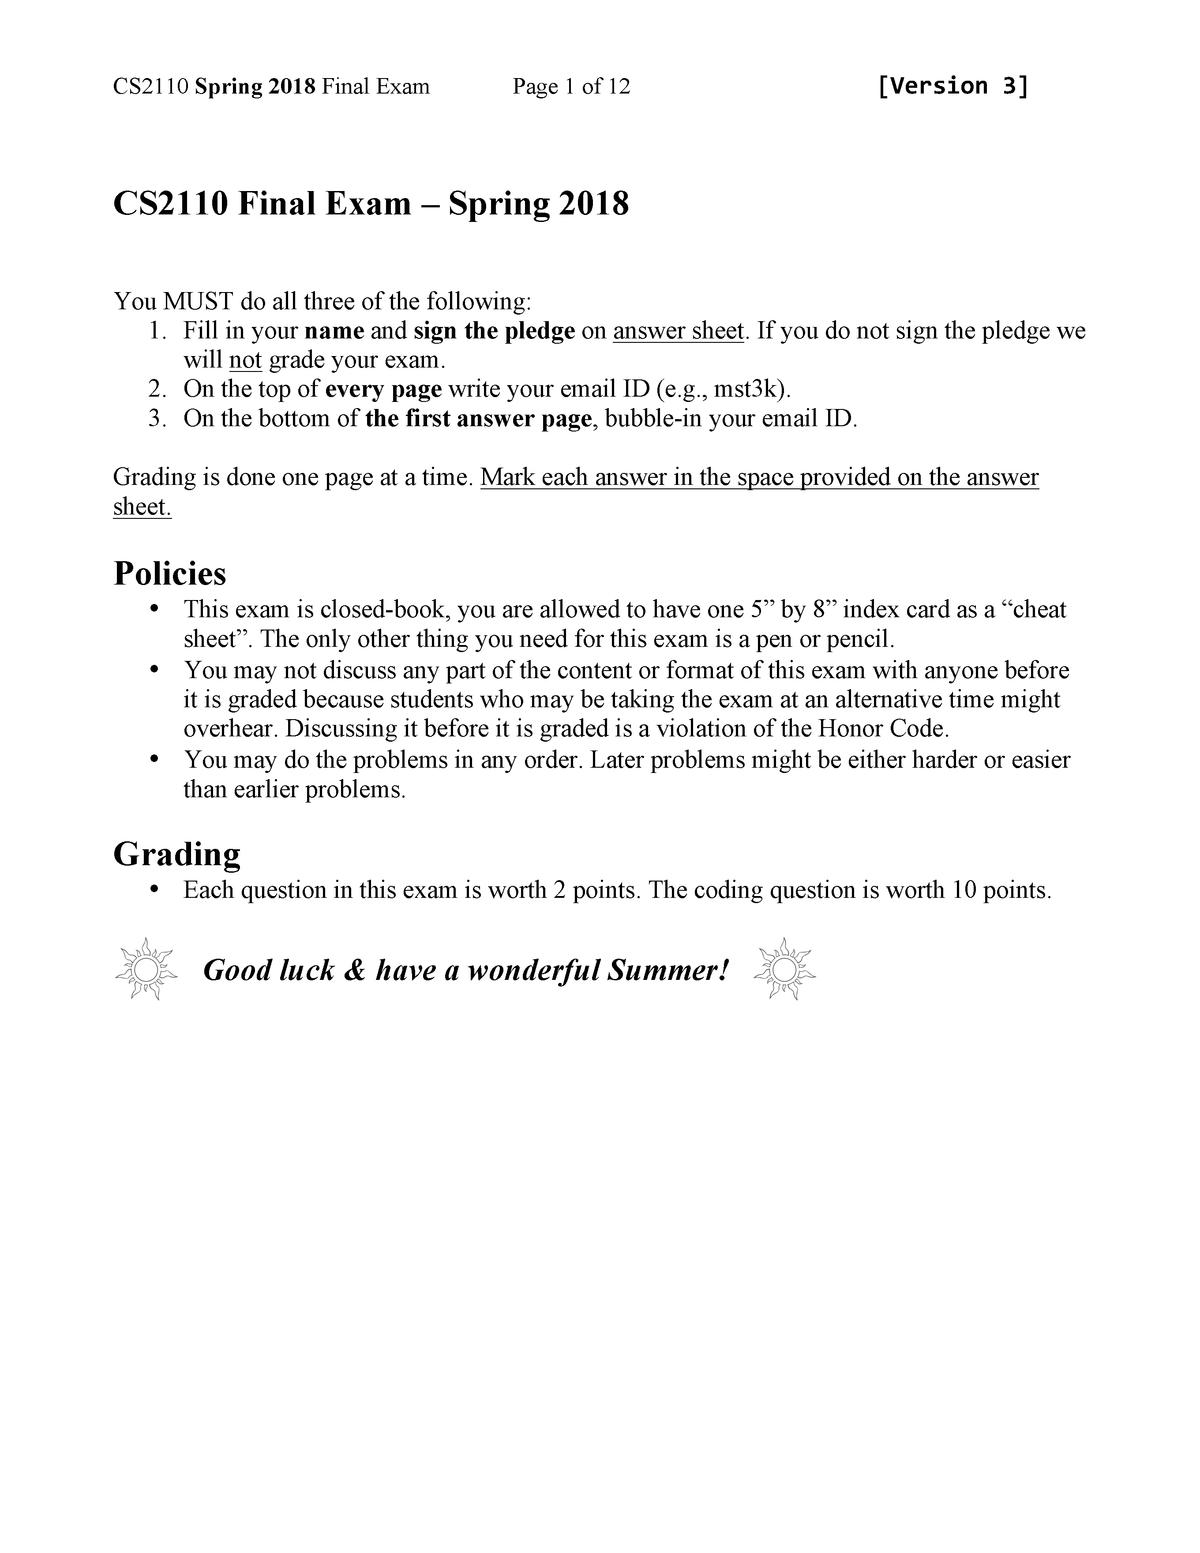 Klausur 2018 - CS 2110: Software Development Methods - StuDocu